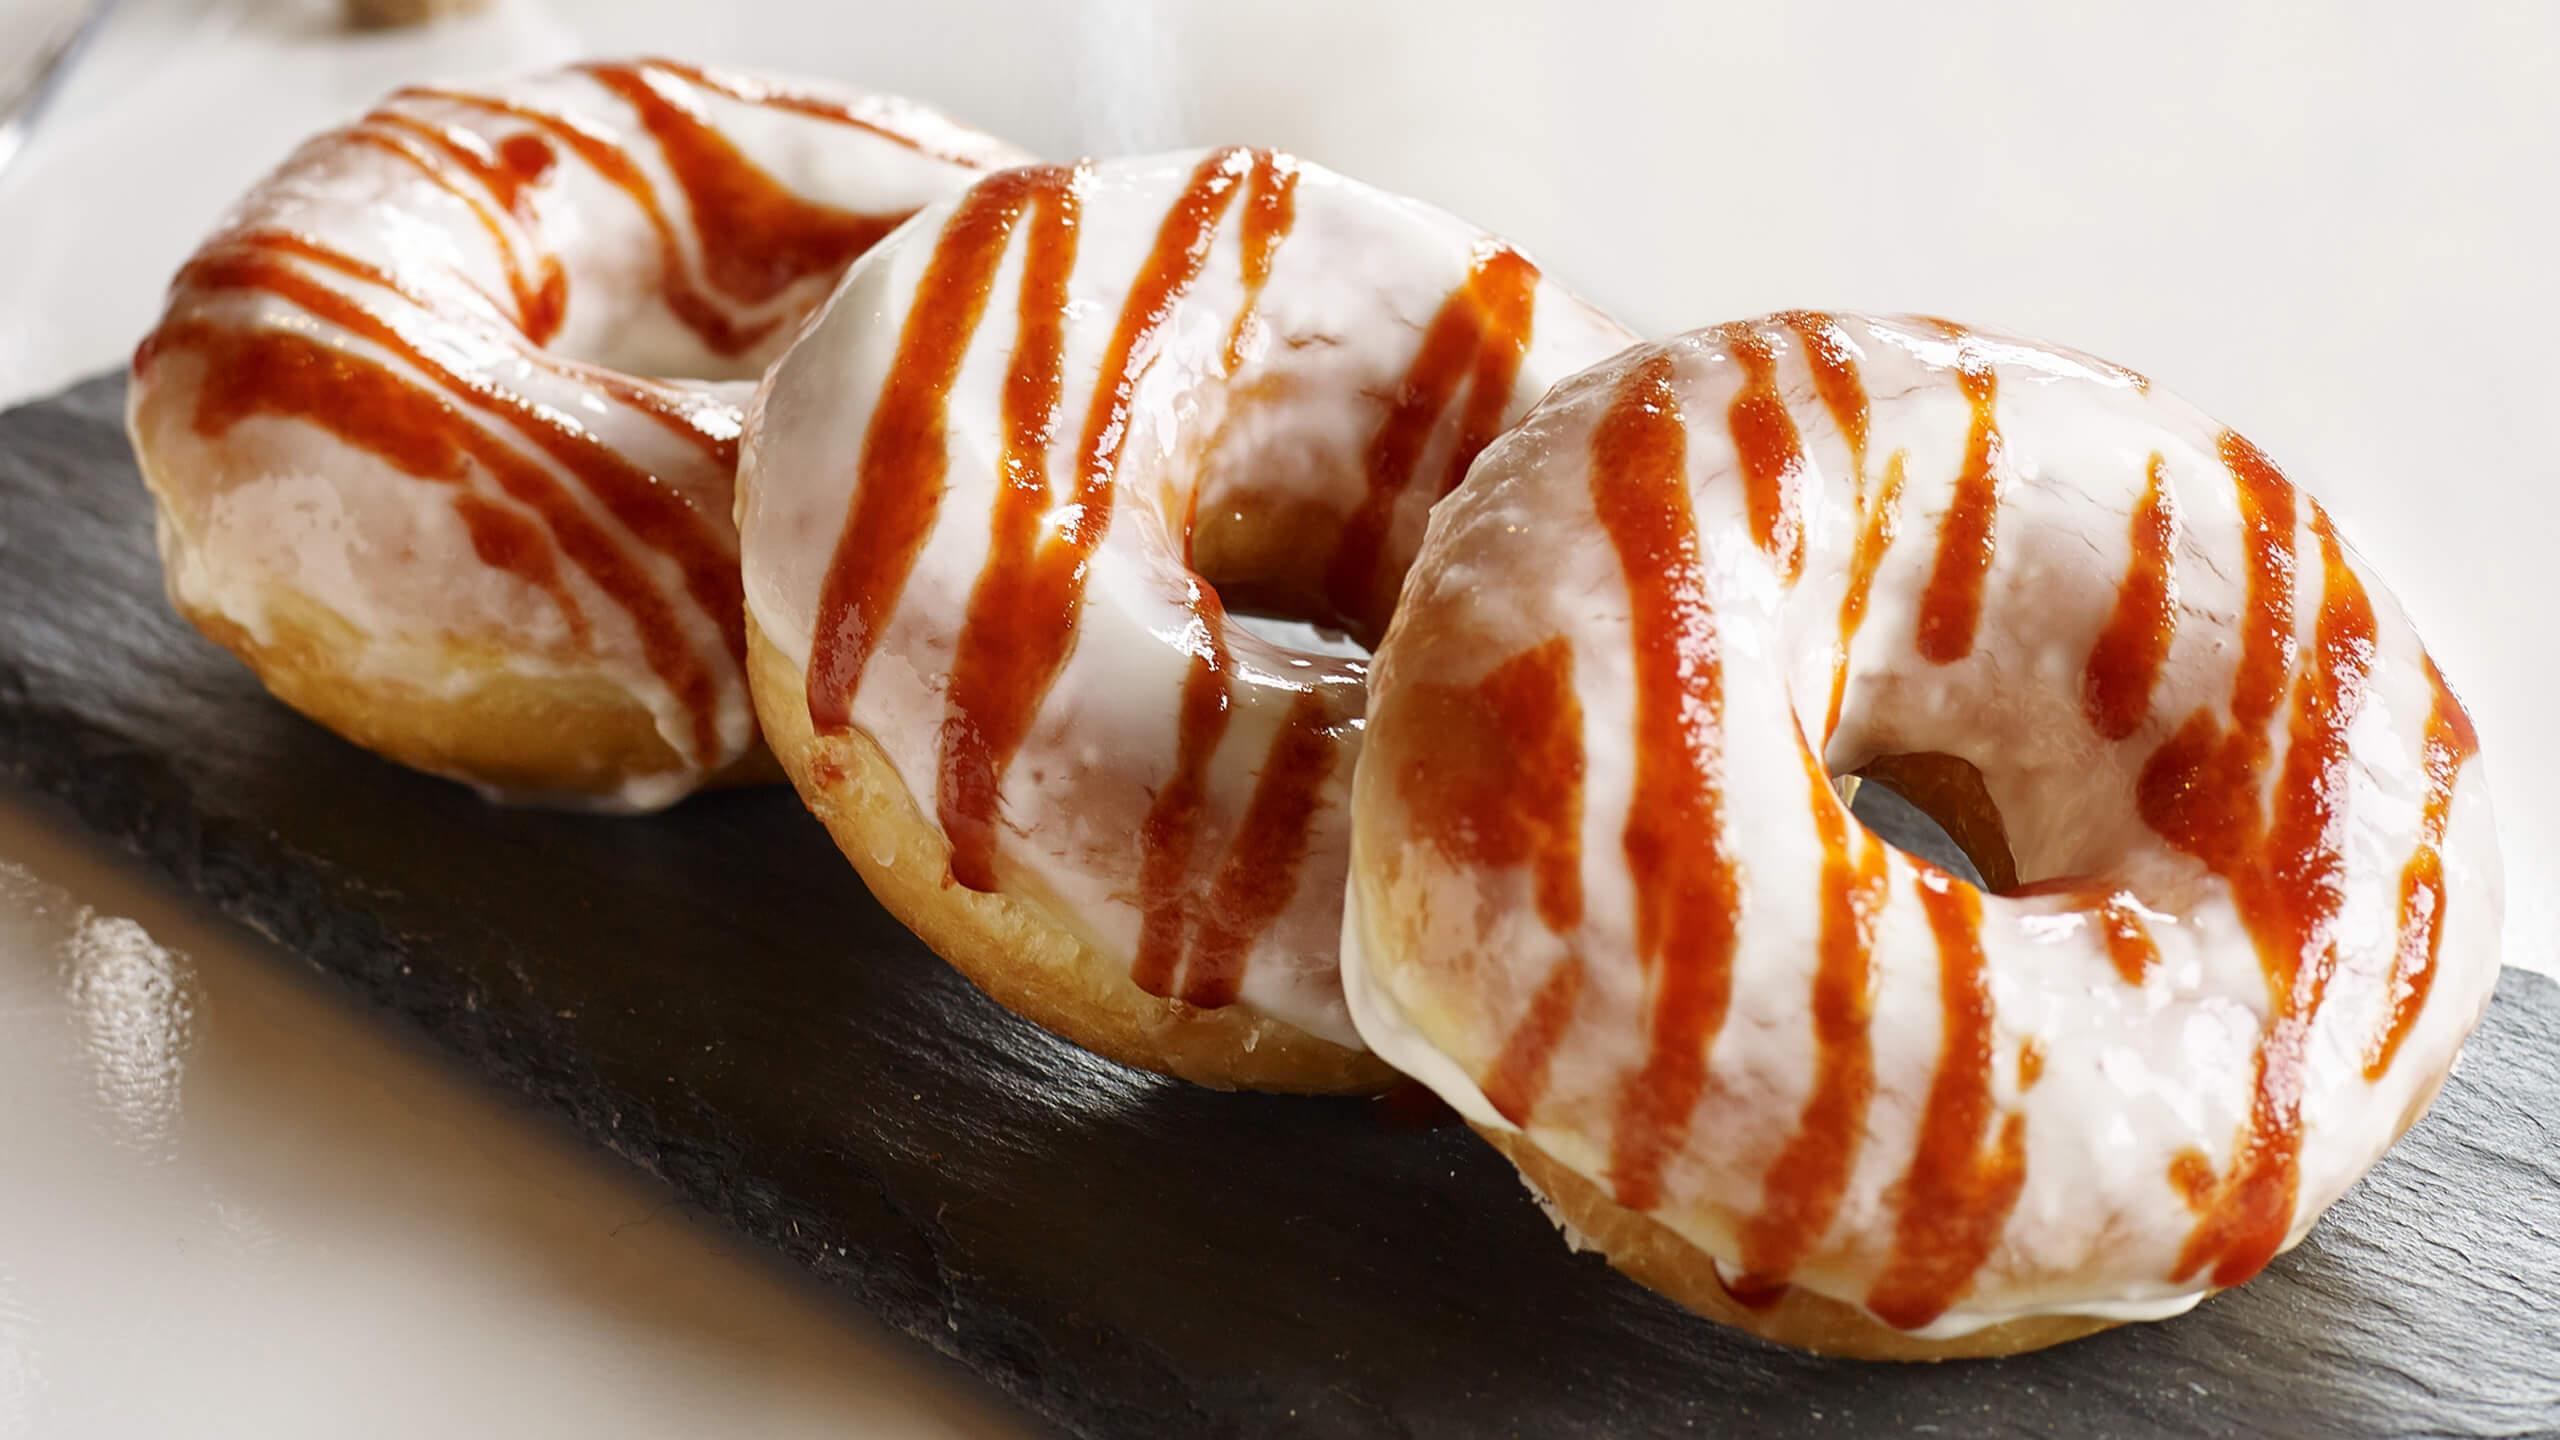 Sugar & Spice Donuts